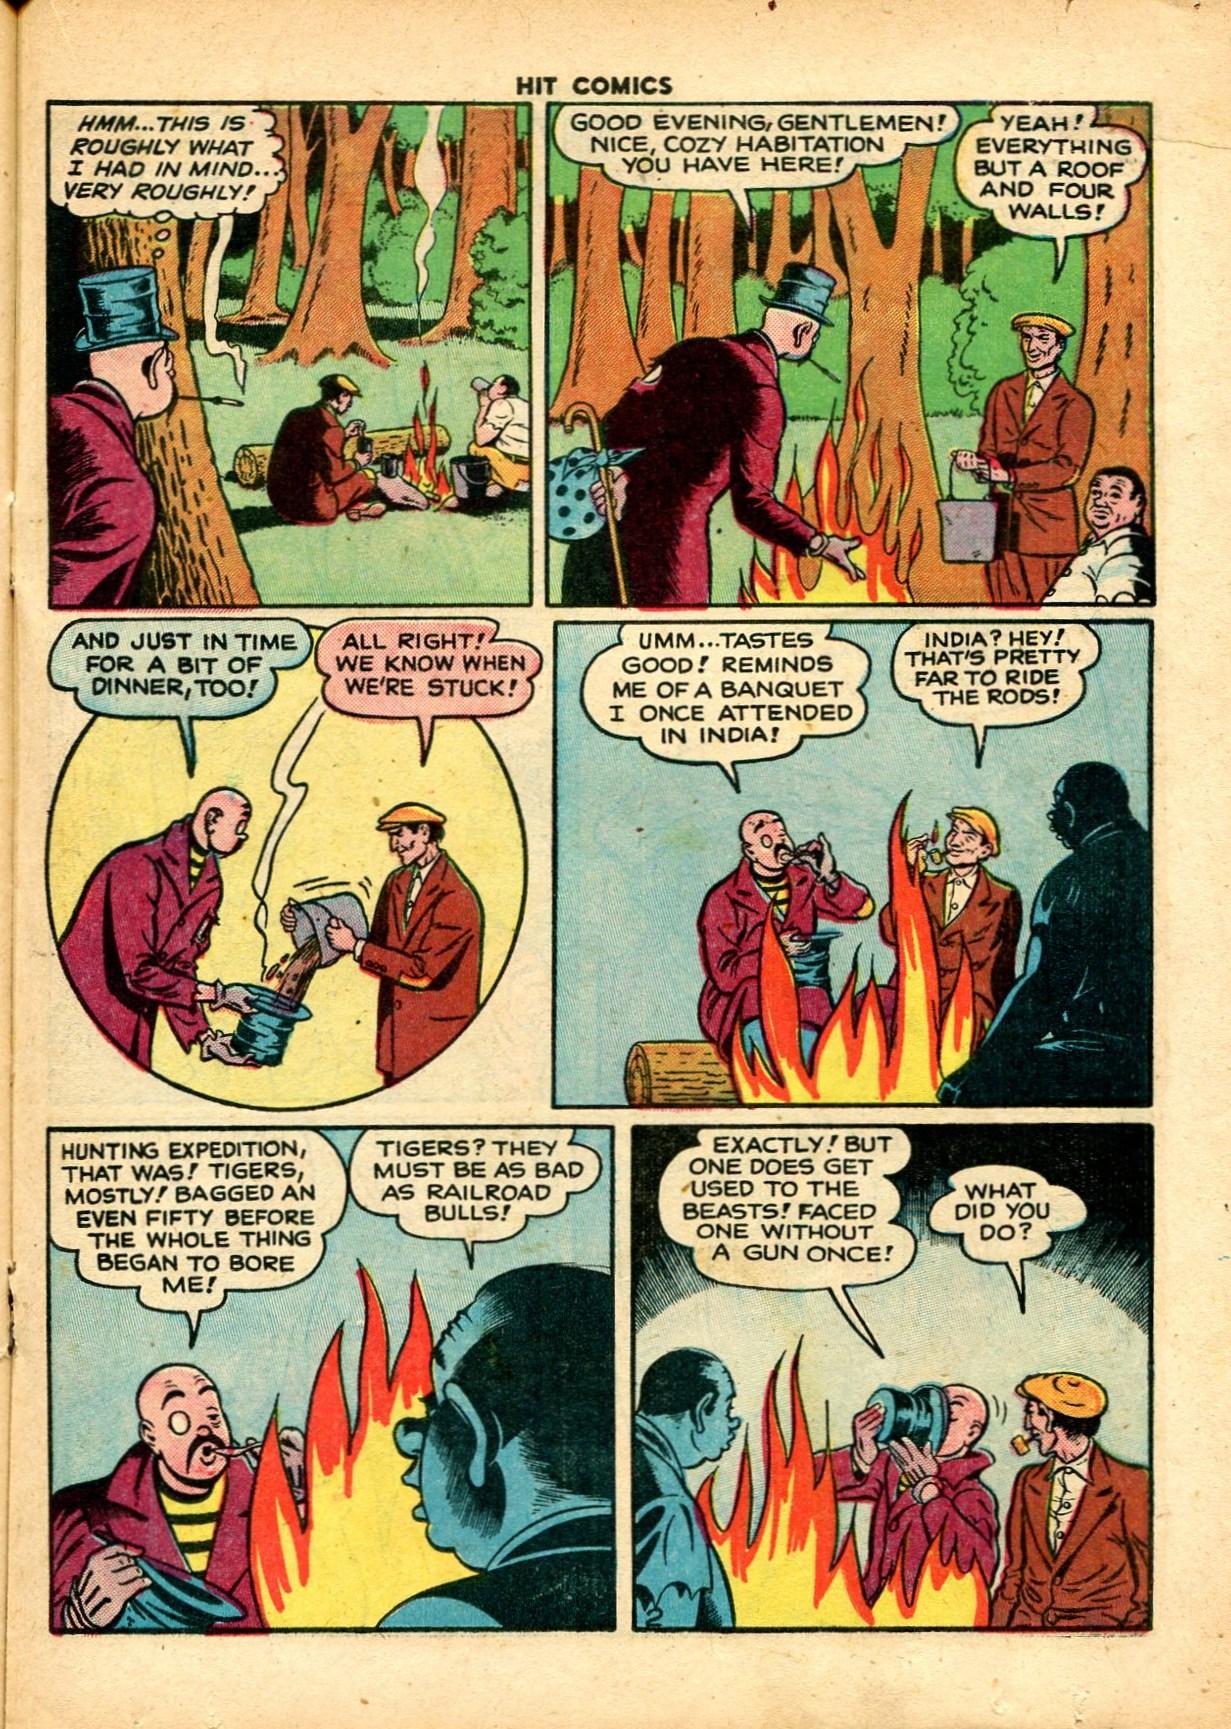 Read online Hit Comics comic -  Issue #59 - 17